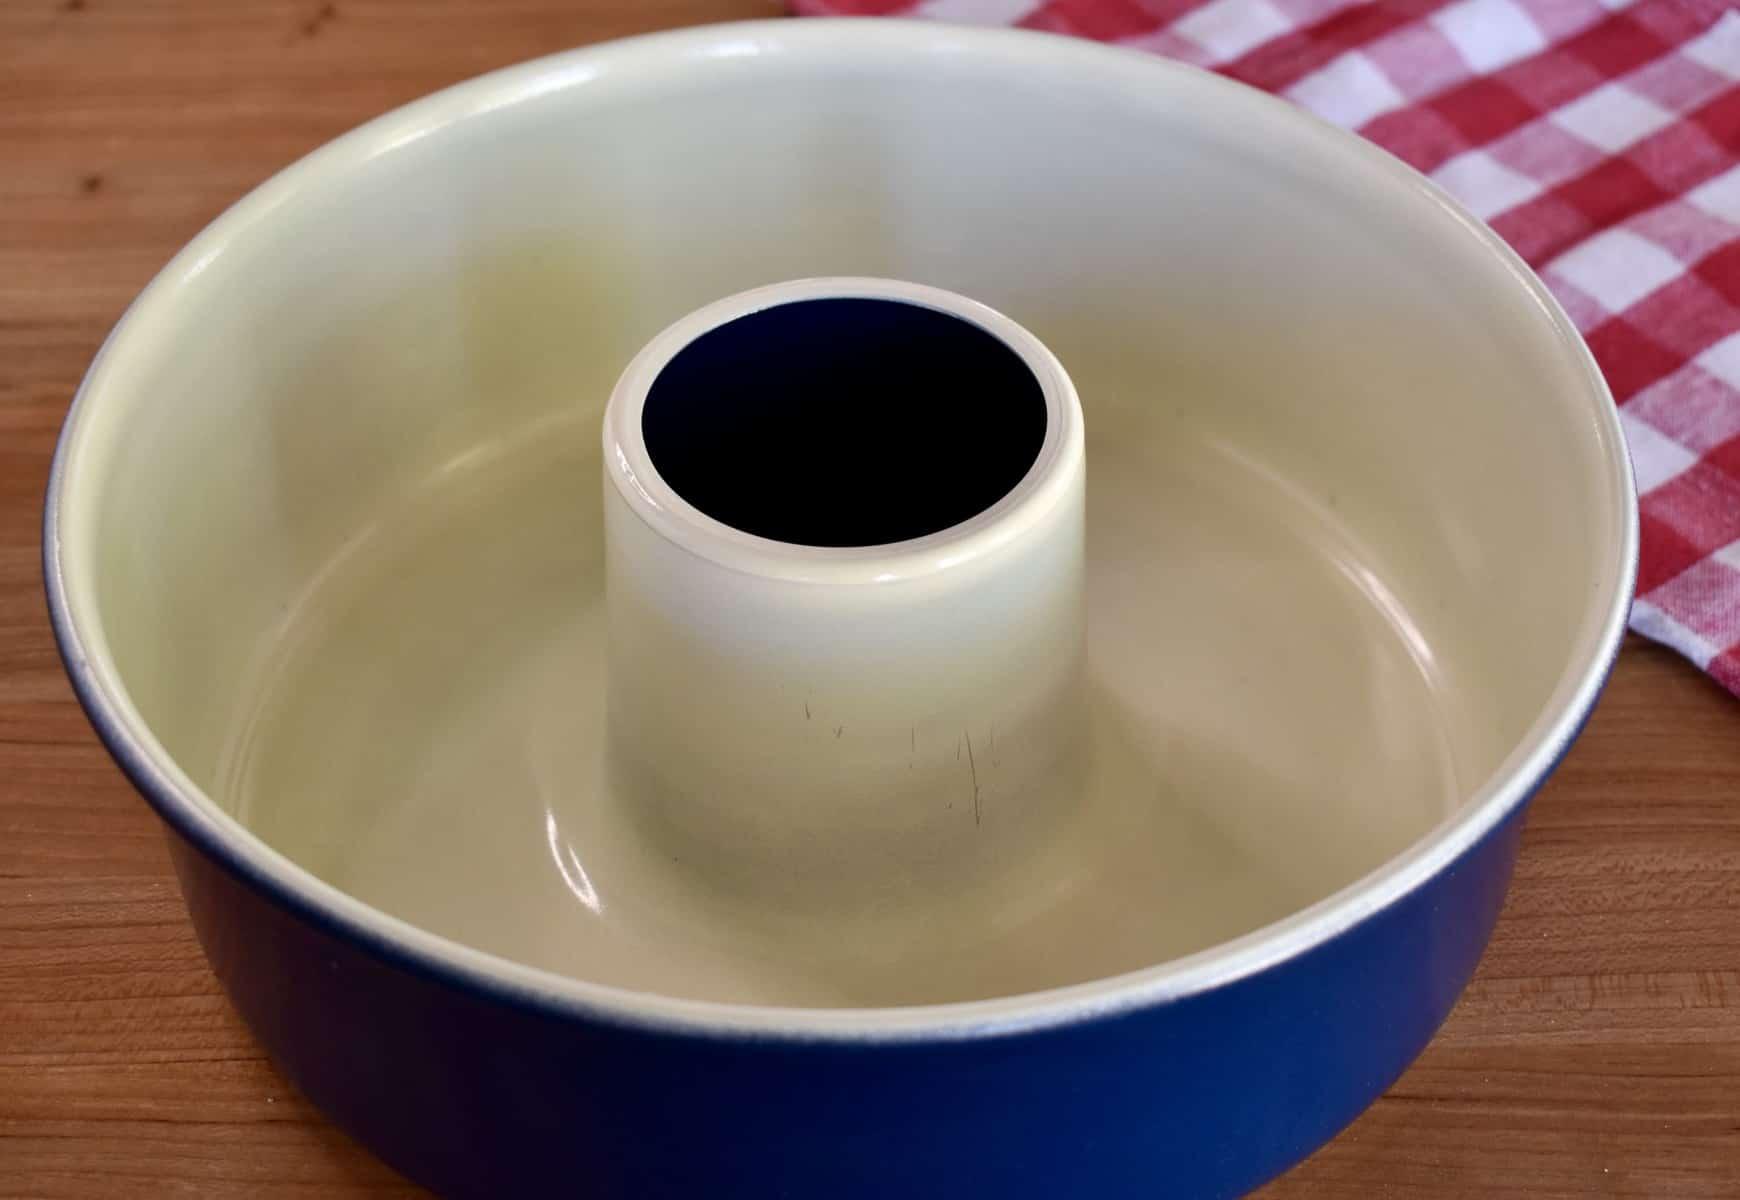 Nordic Ware tube cake pan.